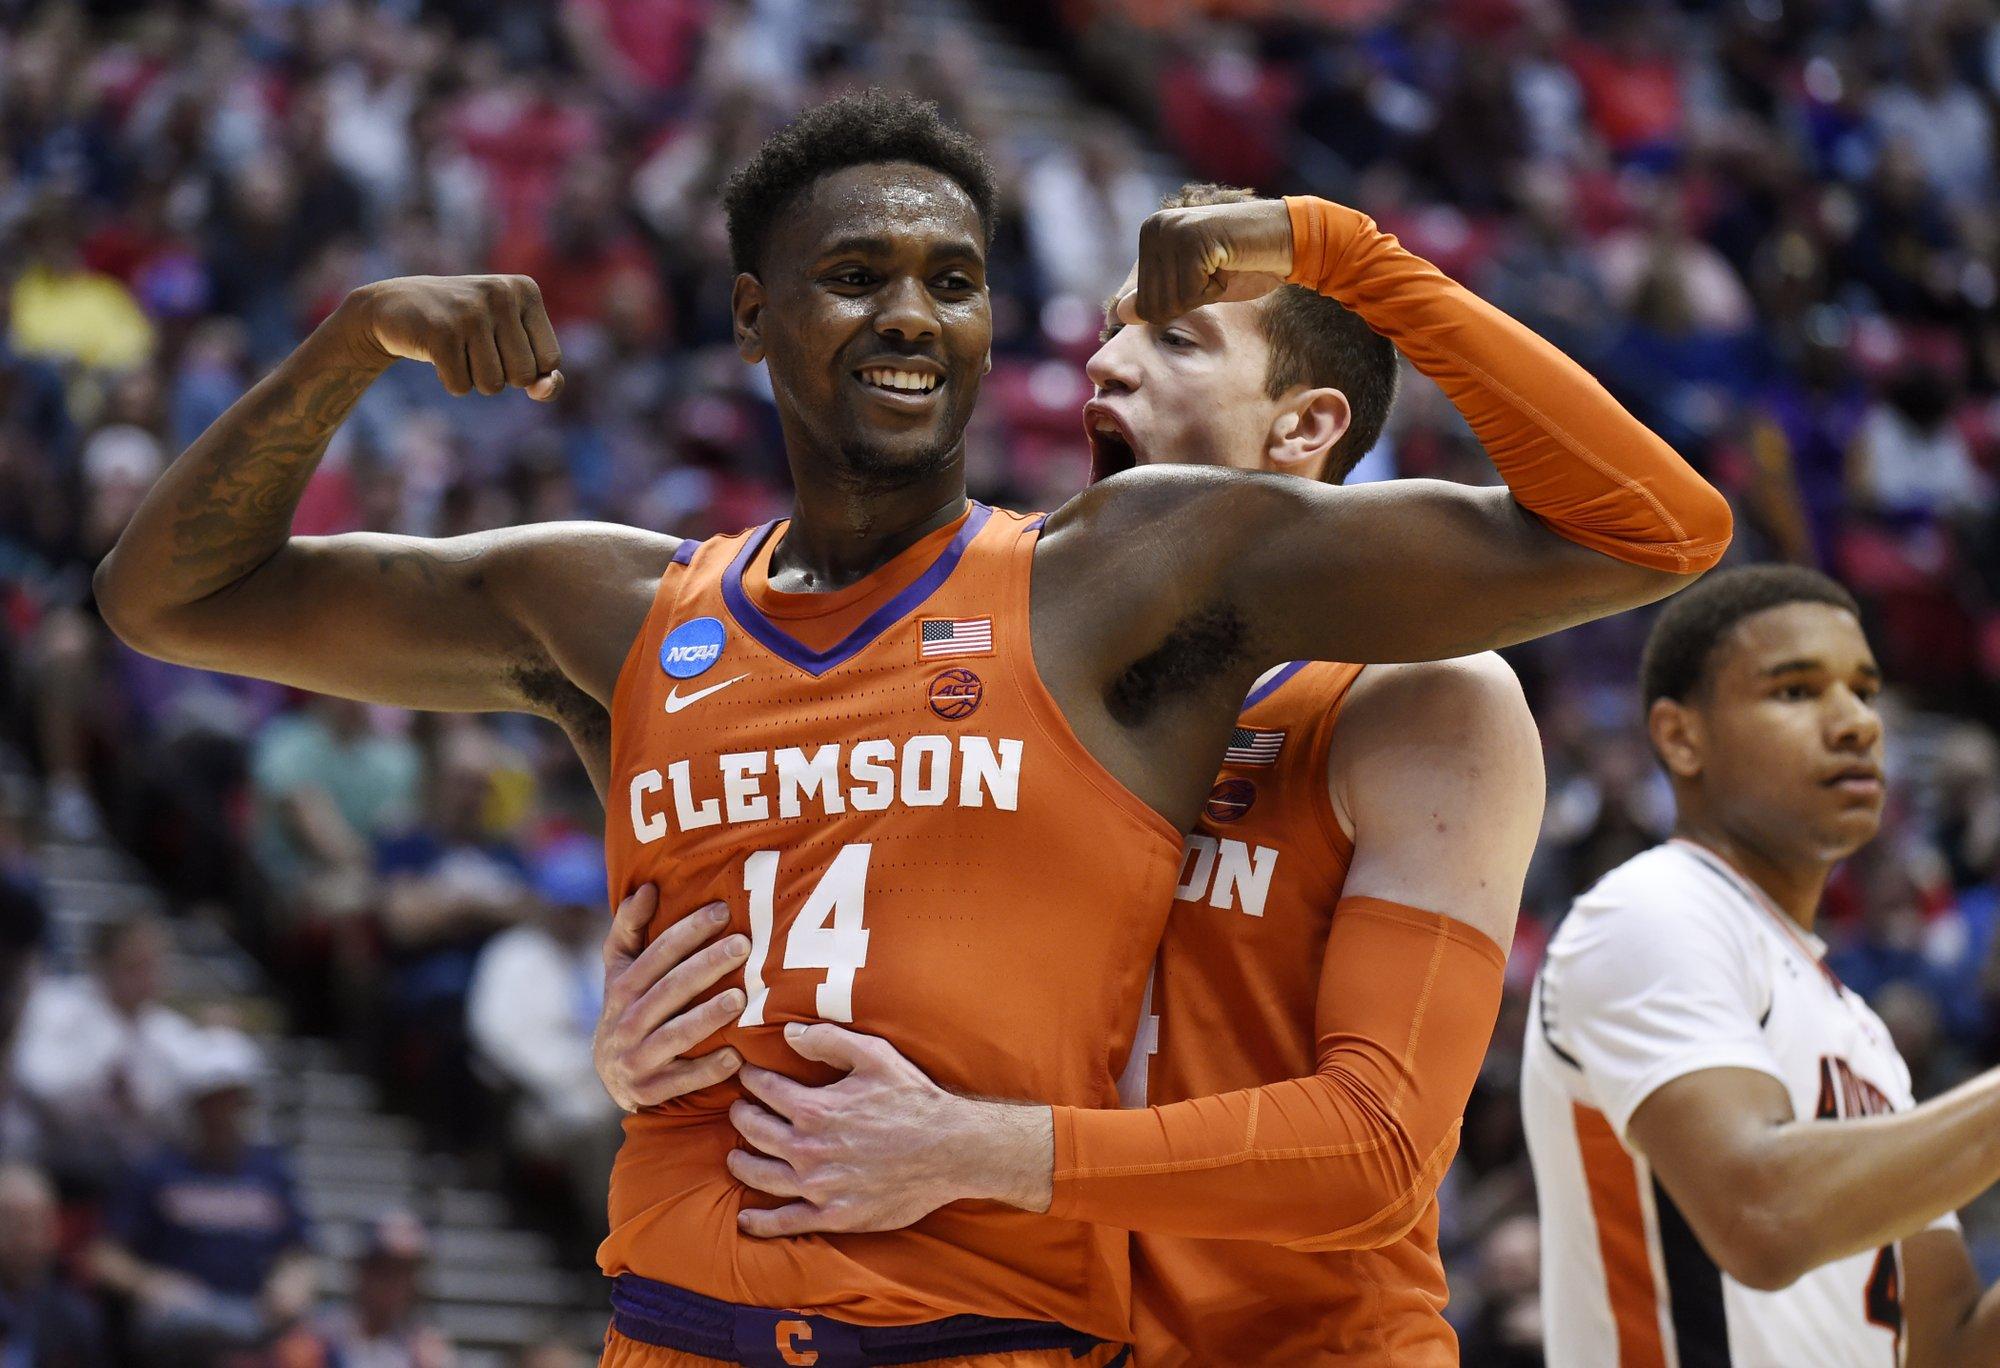 DeVoe, Clemson rout cold-shooting Auburn to reach Sweet 16